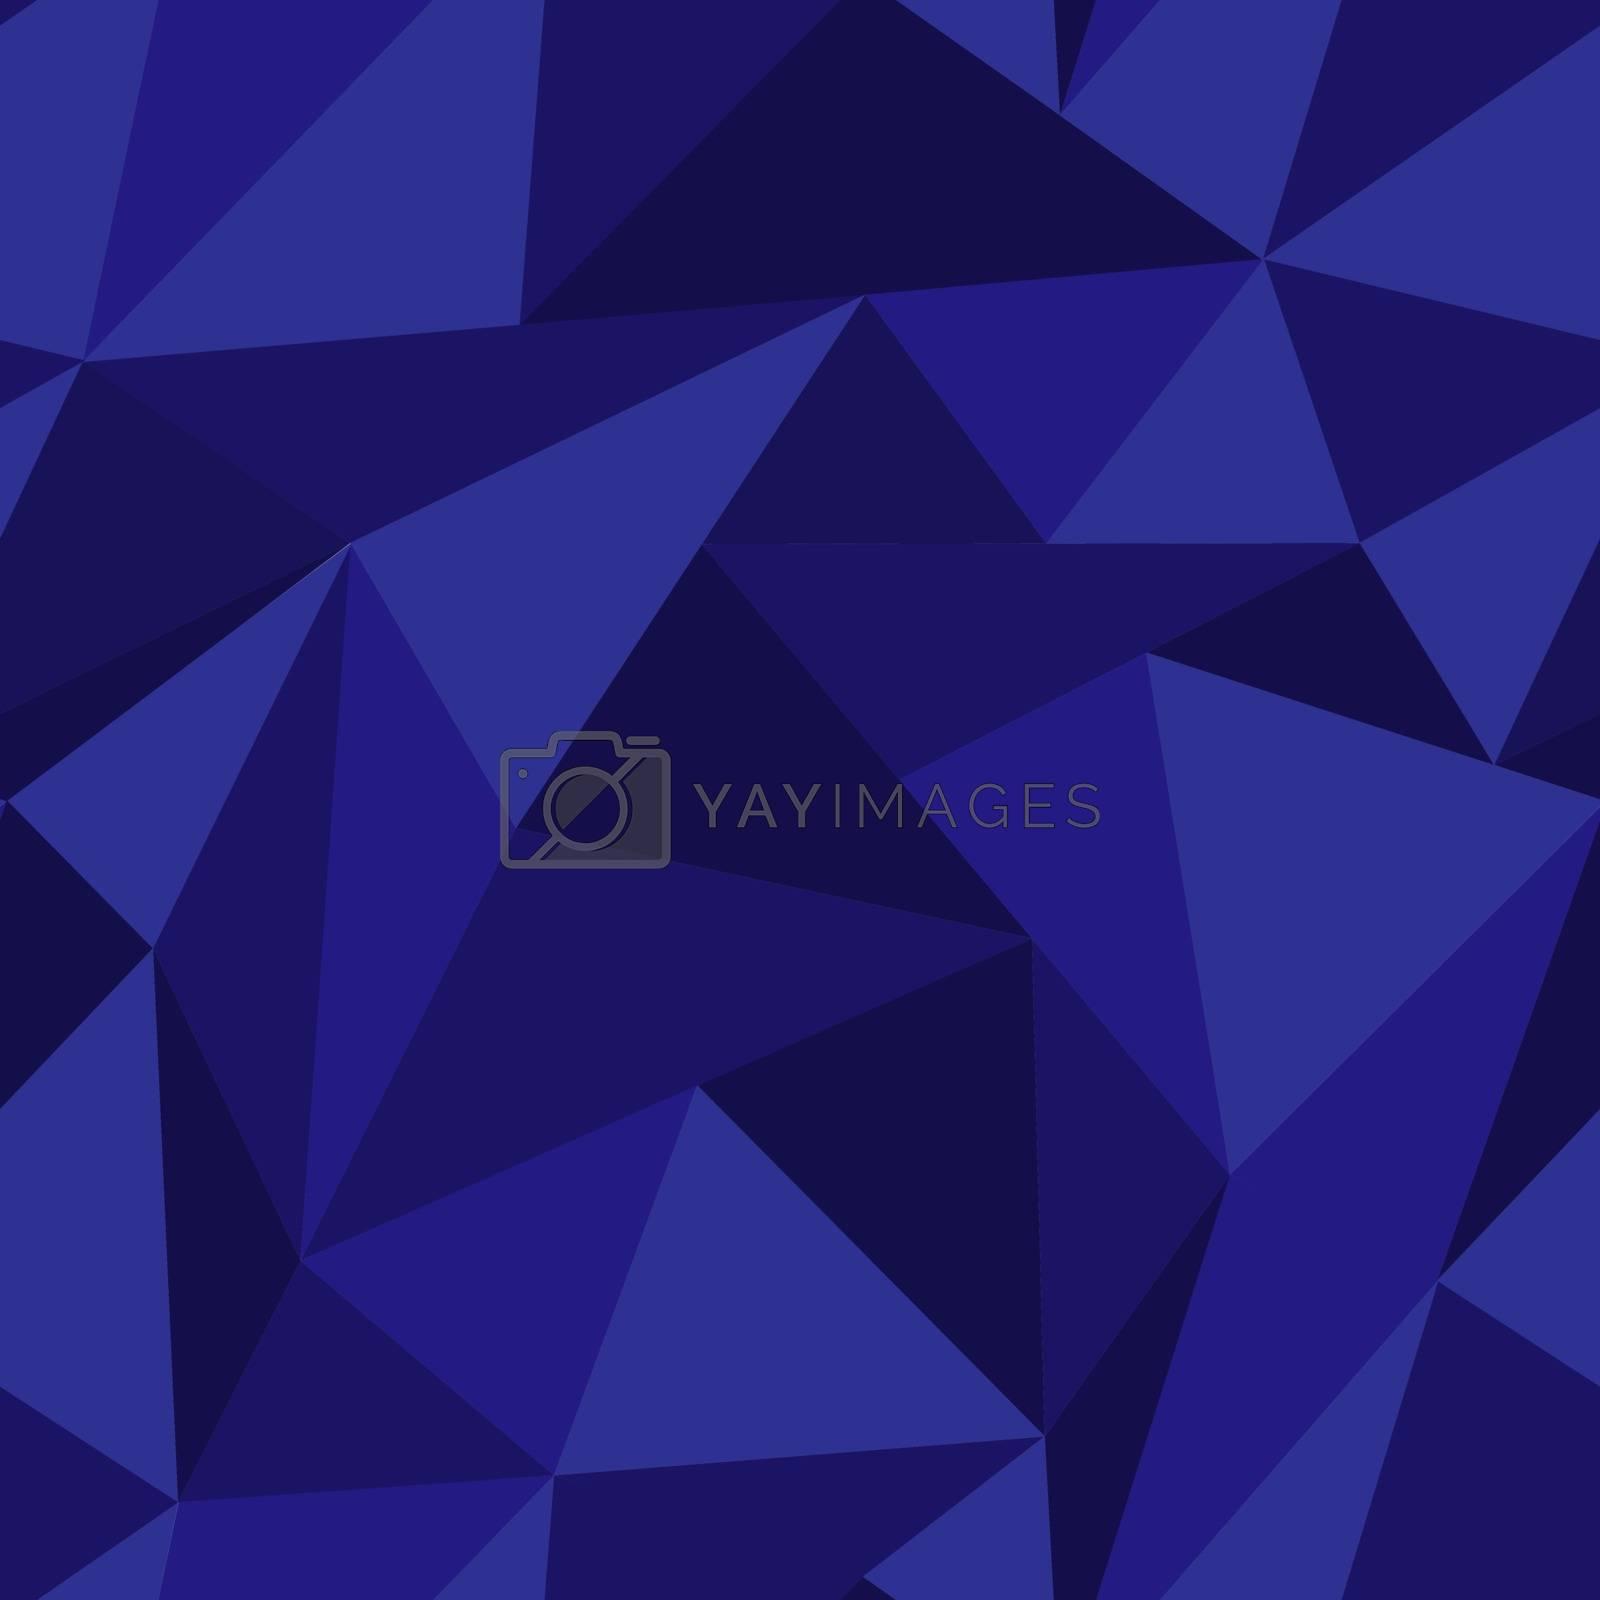 Techno seamless pattern with mosaic of random dark blue triangles